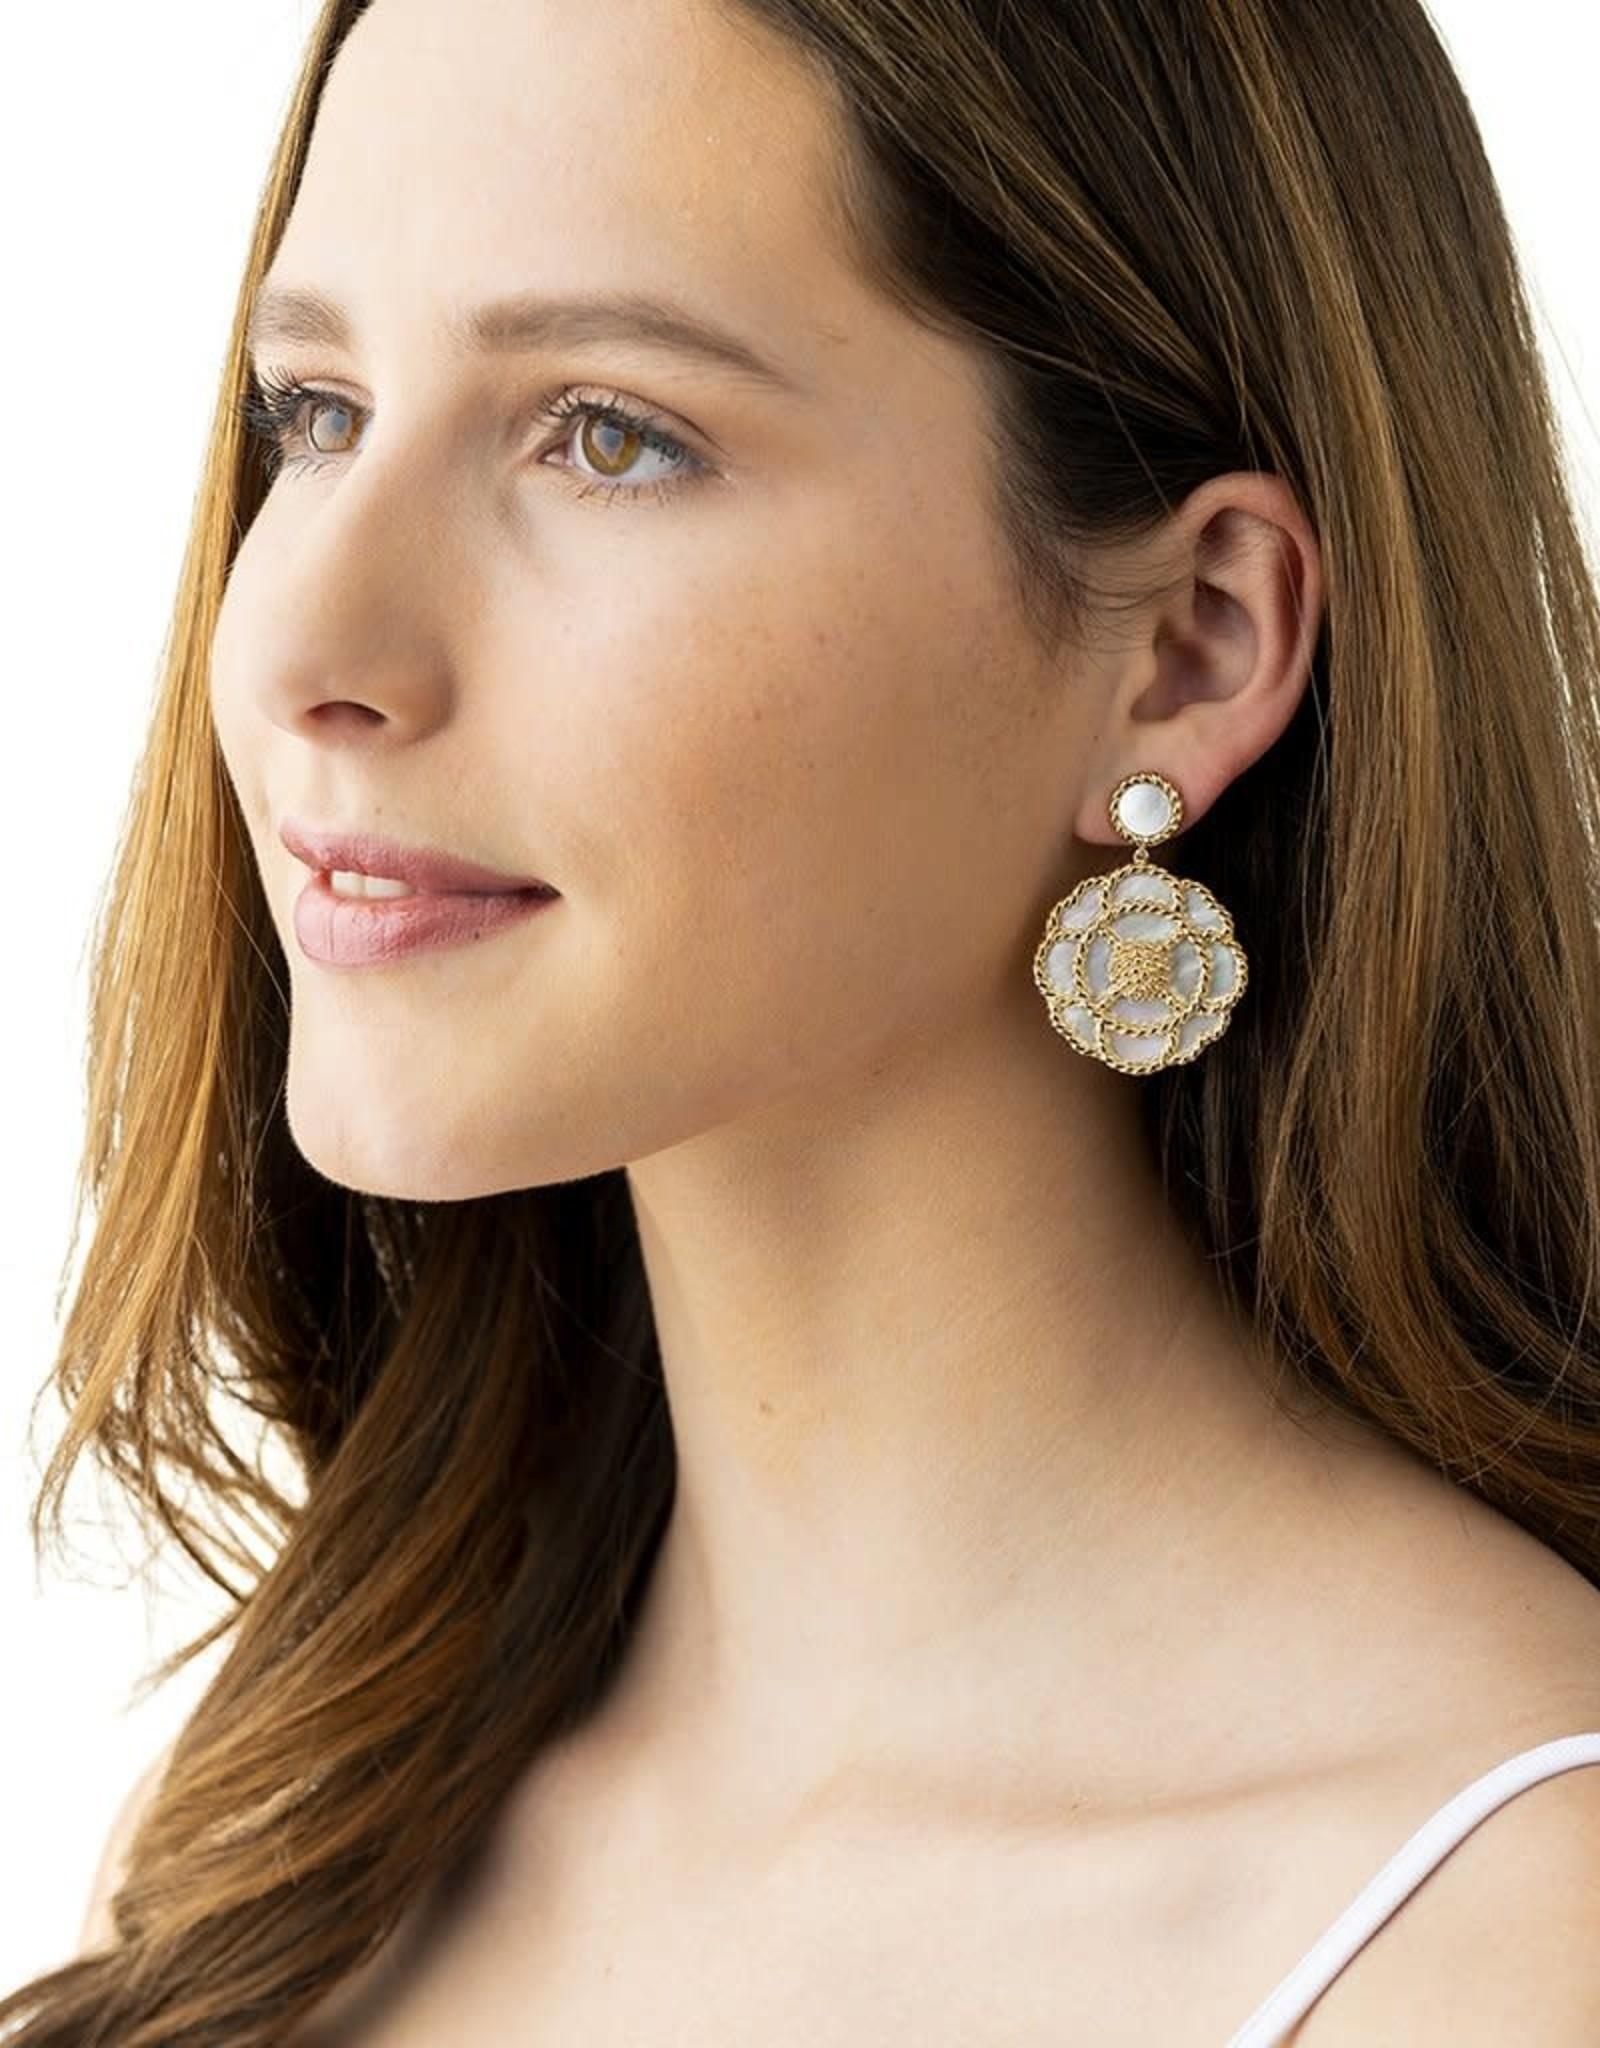 Capucine de Wulf Grande Capucine Earring